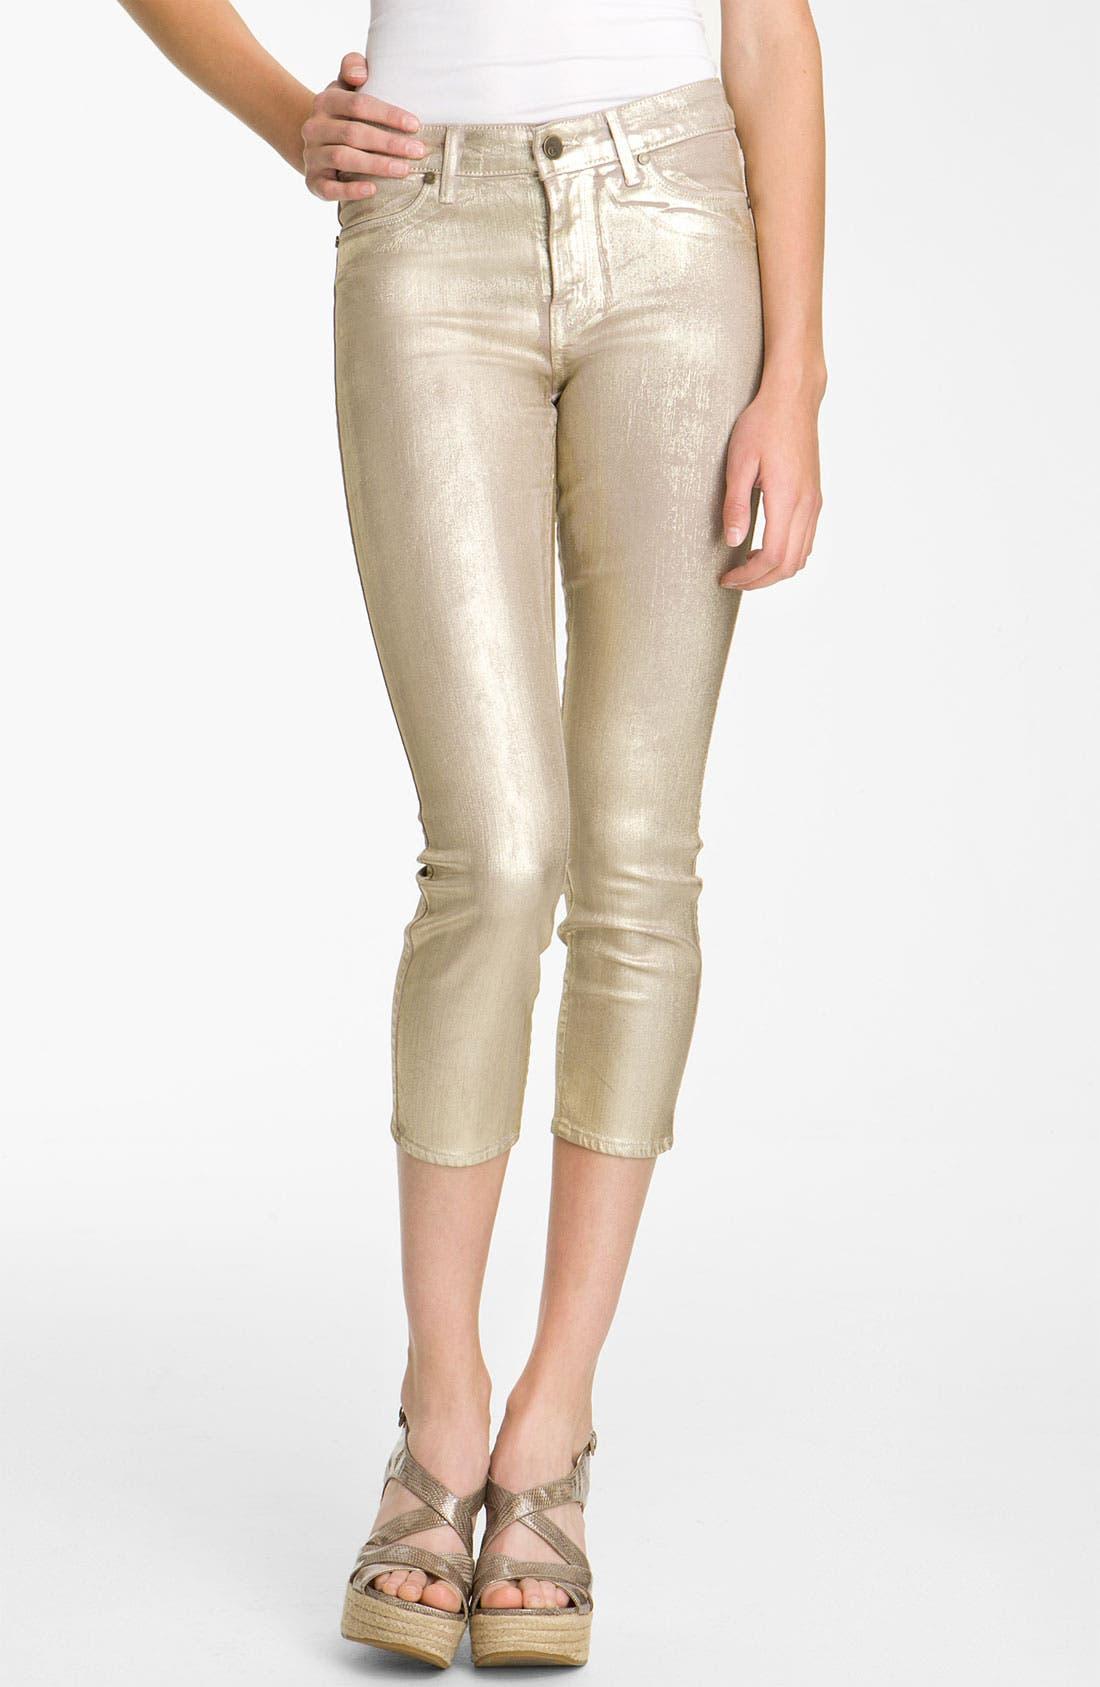 Main Image - CJ by Cookie Johnson 'Believe Sparkle' Coated Crop Denim Leggings (Gold Dust)